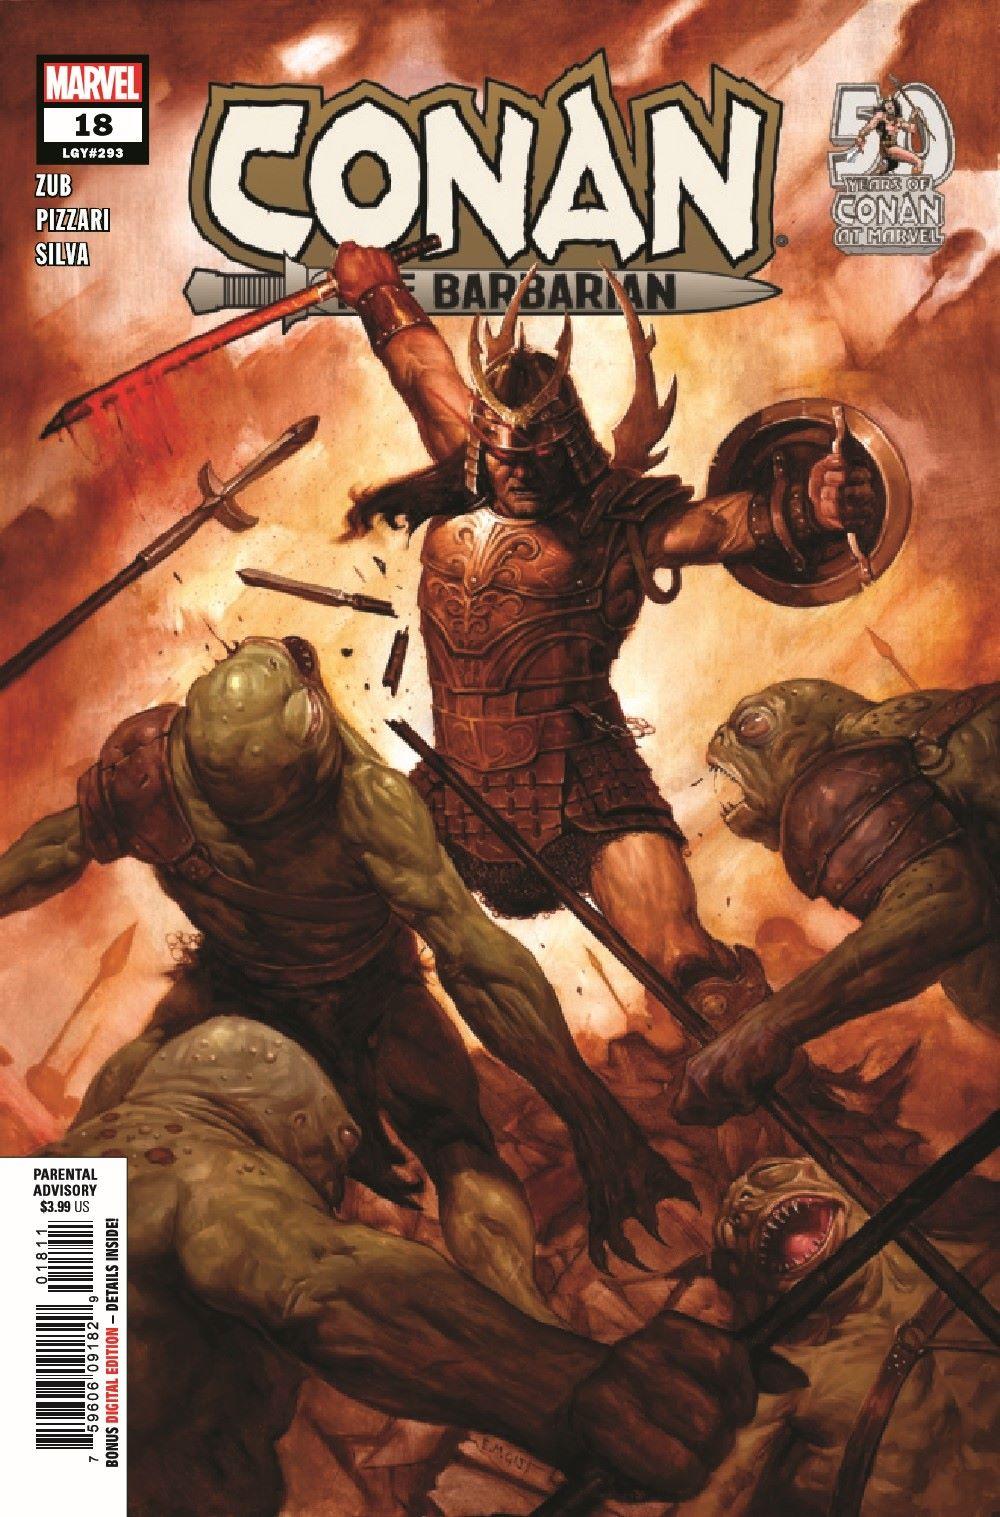 CONANBARB2019018_Preview-1 ComicList Previews: CONAN THE BARBARIAN #18